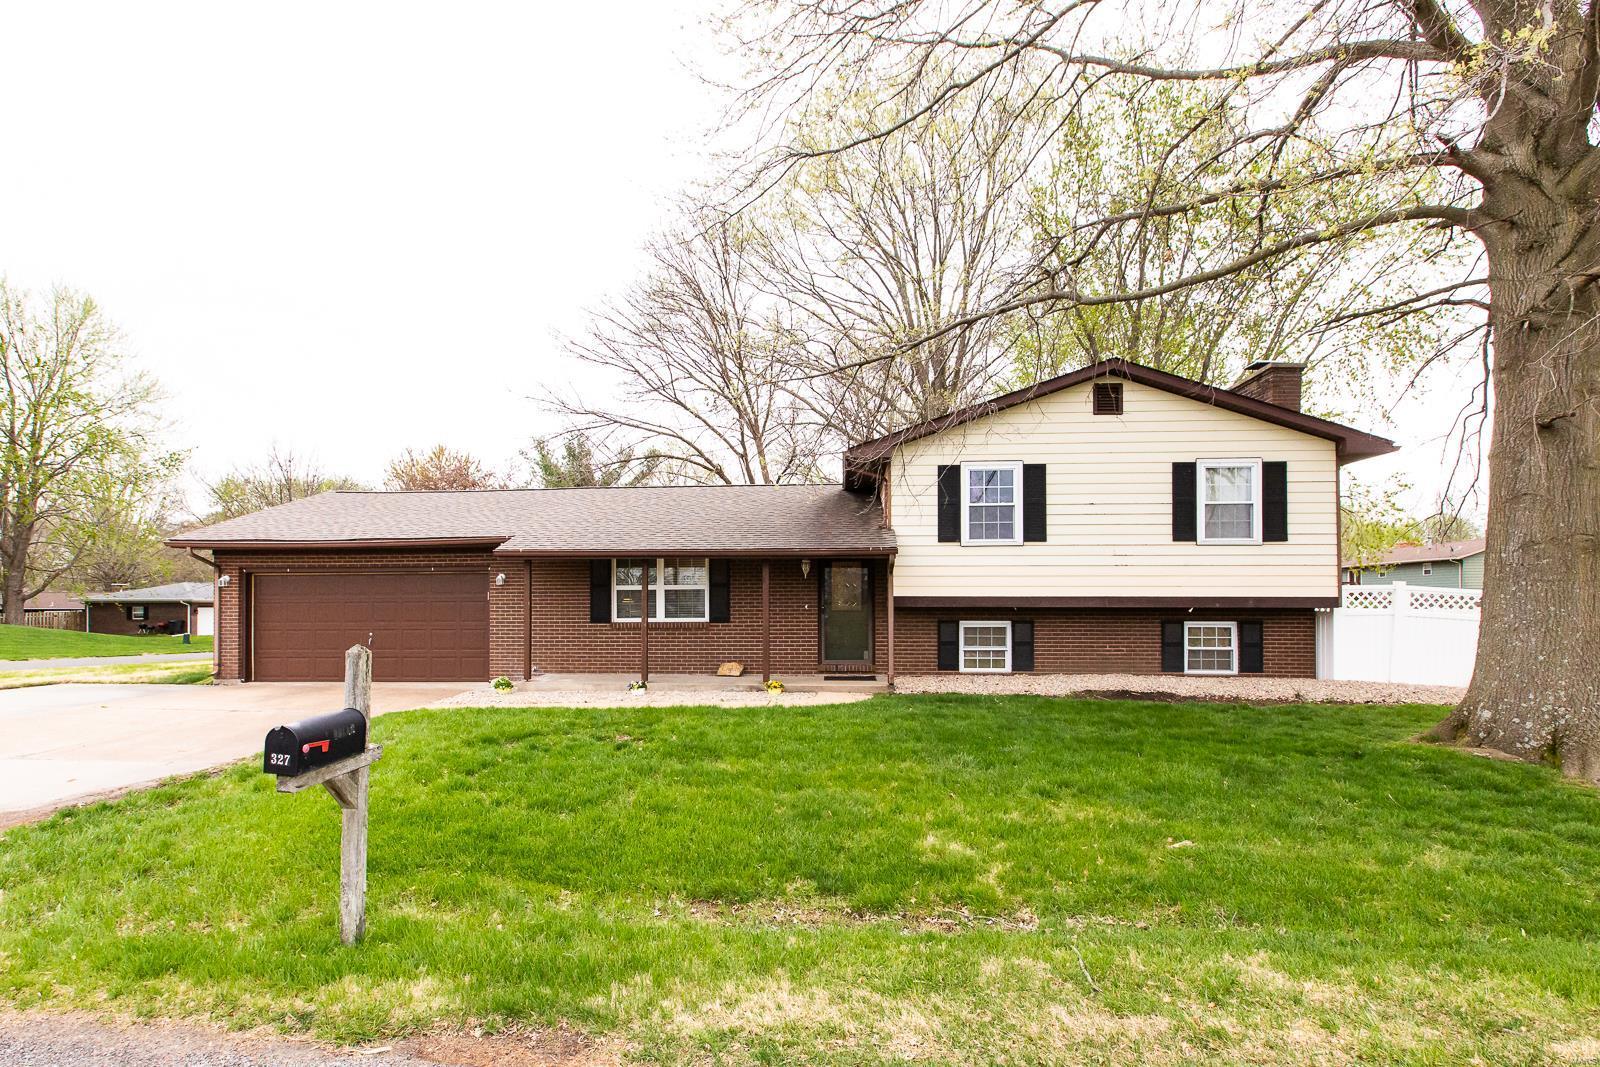 327 Sunset Drive Property Photo - Smithton, IL real estate listing